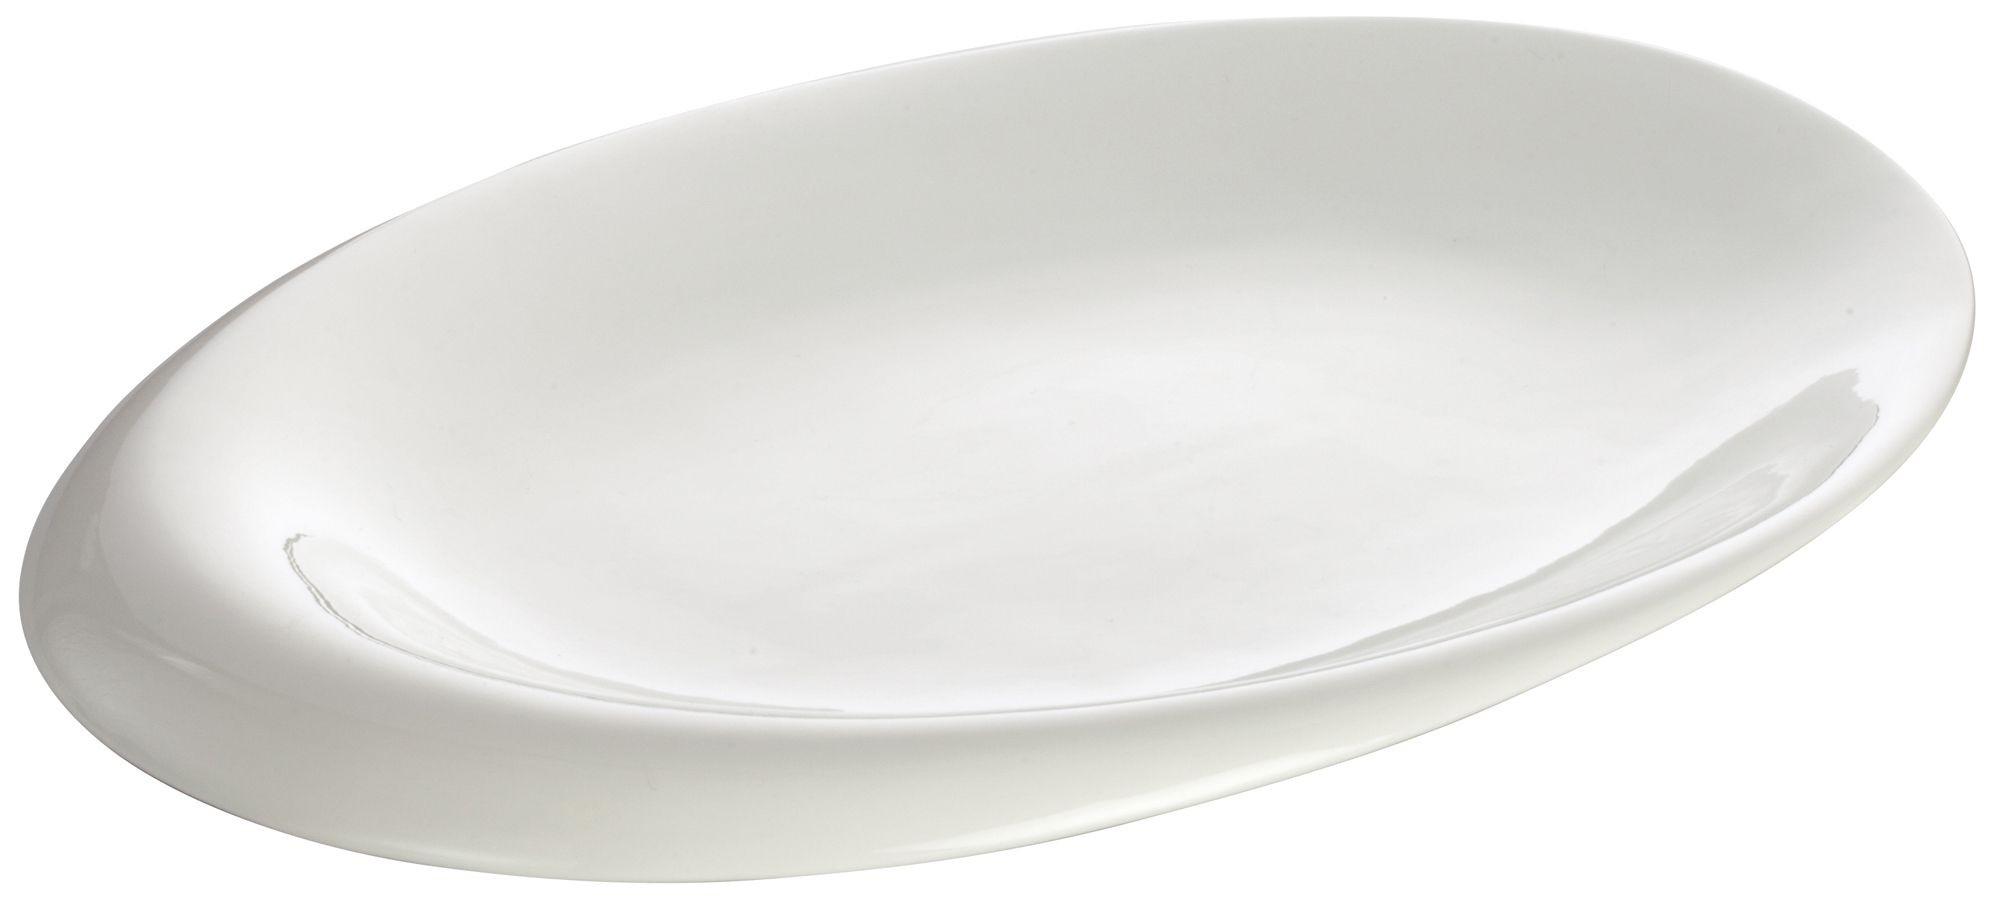 "Winco WDP004-211 Ocea Creamy White Porcelain Oval Bowl 14"" x 10-1/4"""